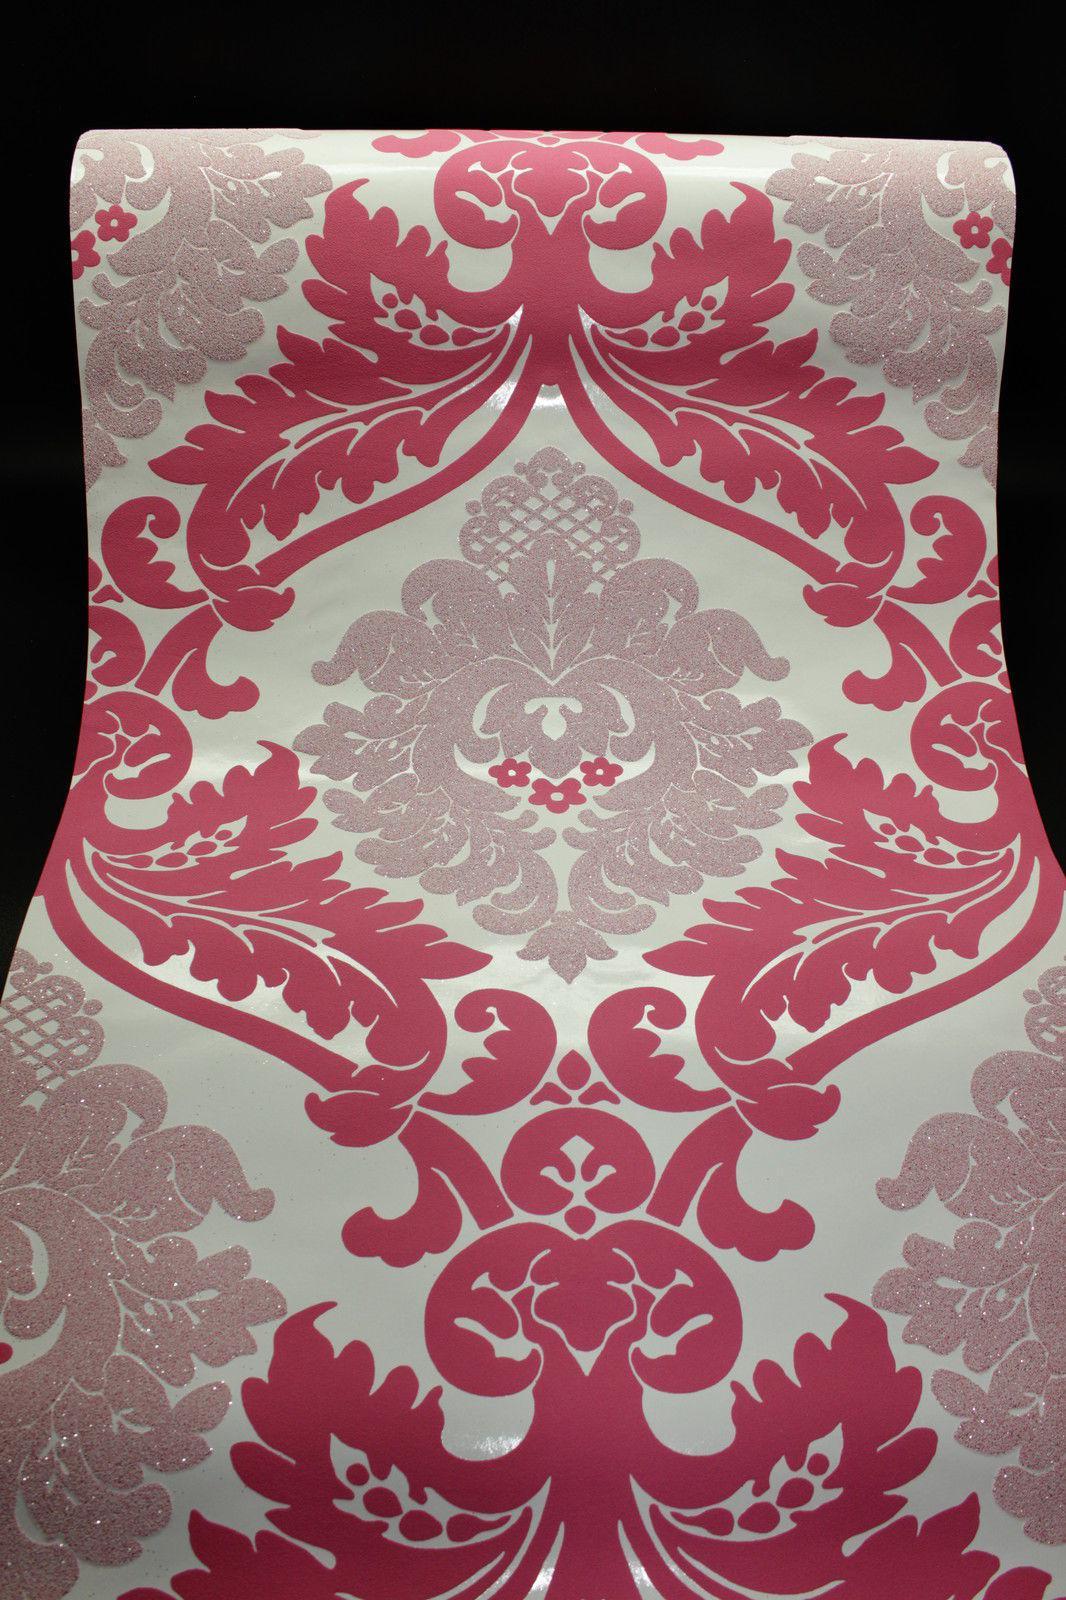 Vlies Tapete Barock Muster Ornament pink weiß glitzer effekt ...